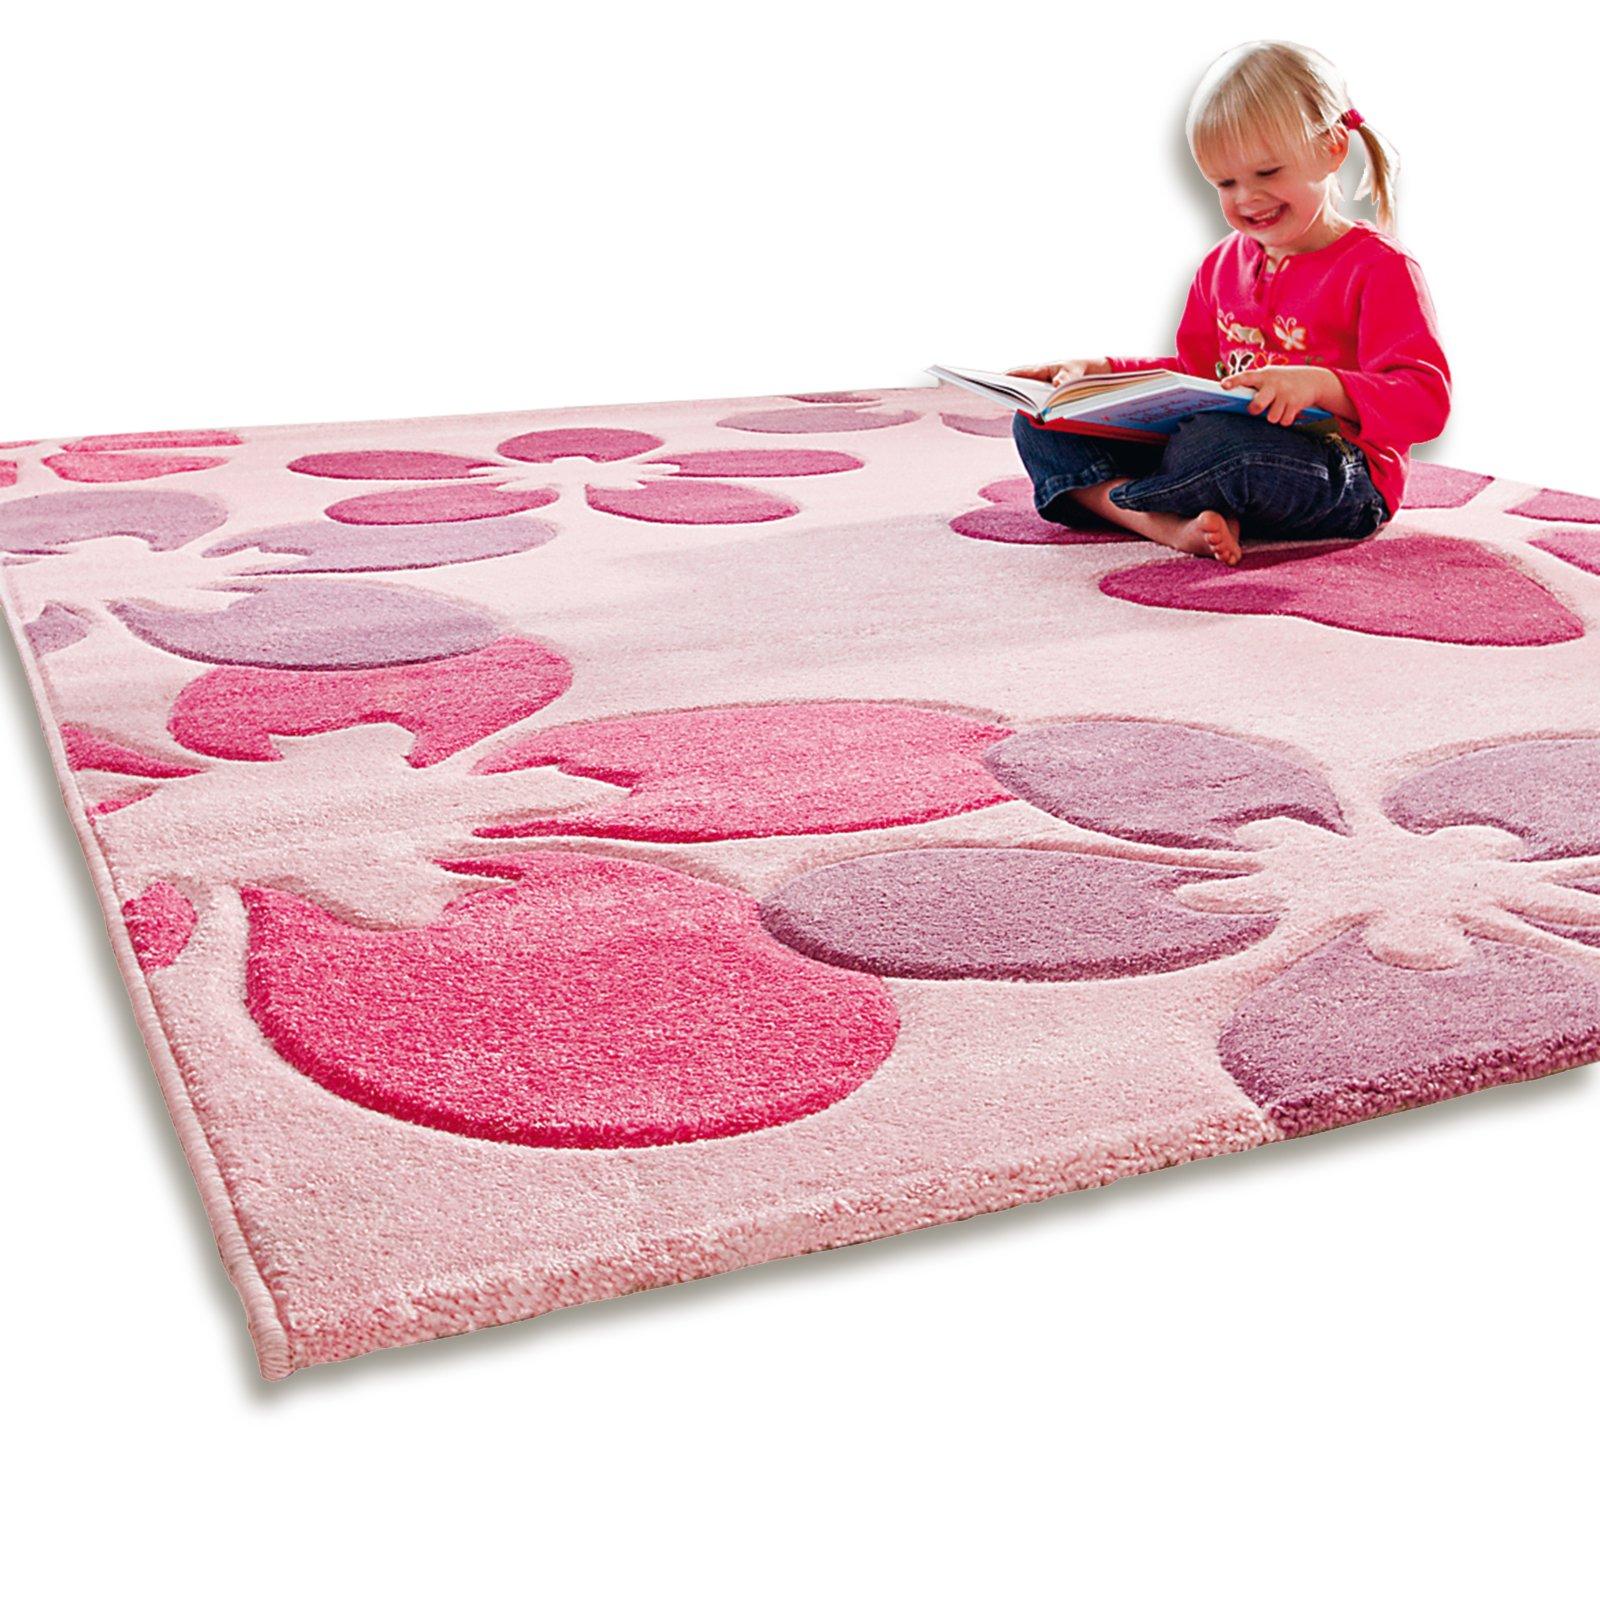 teppich flair pink 120x170 cm gemusterte teppiche. Black Bedroom Furniture Sets. Home Design Ideas